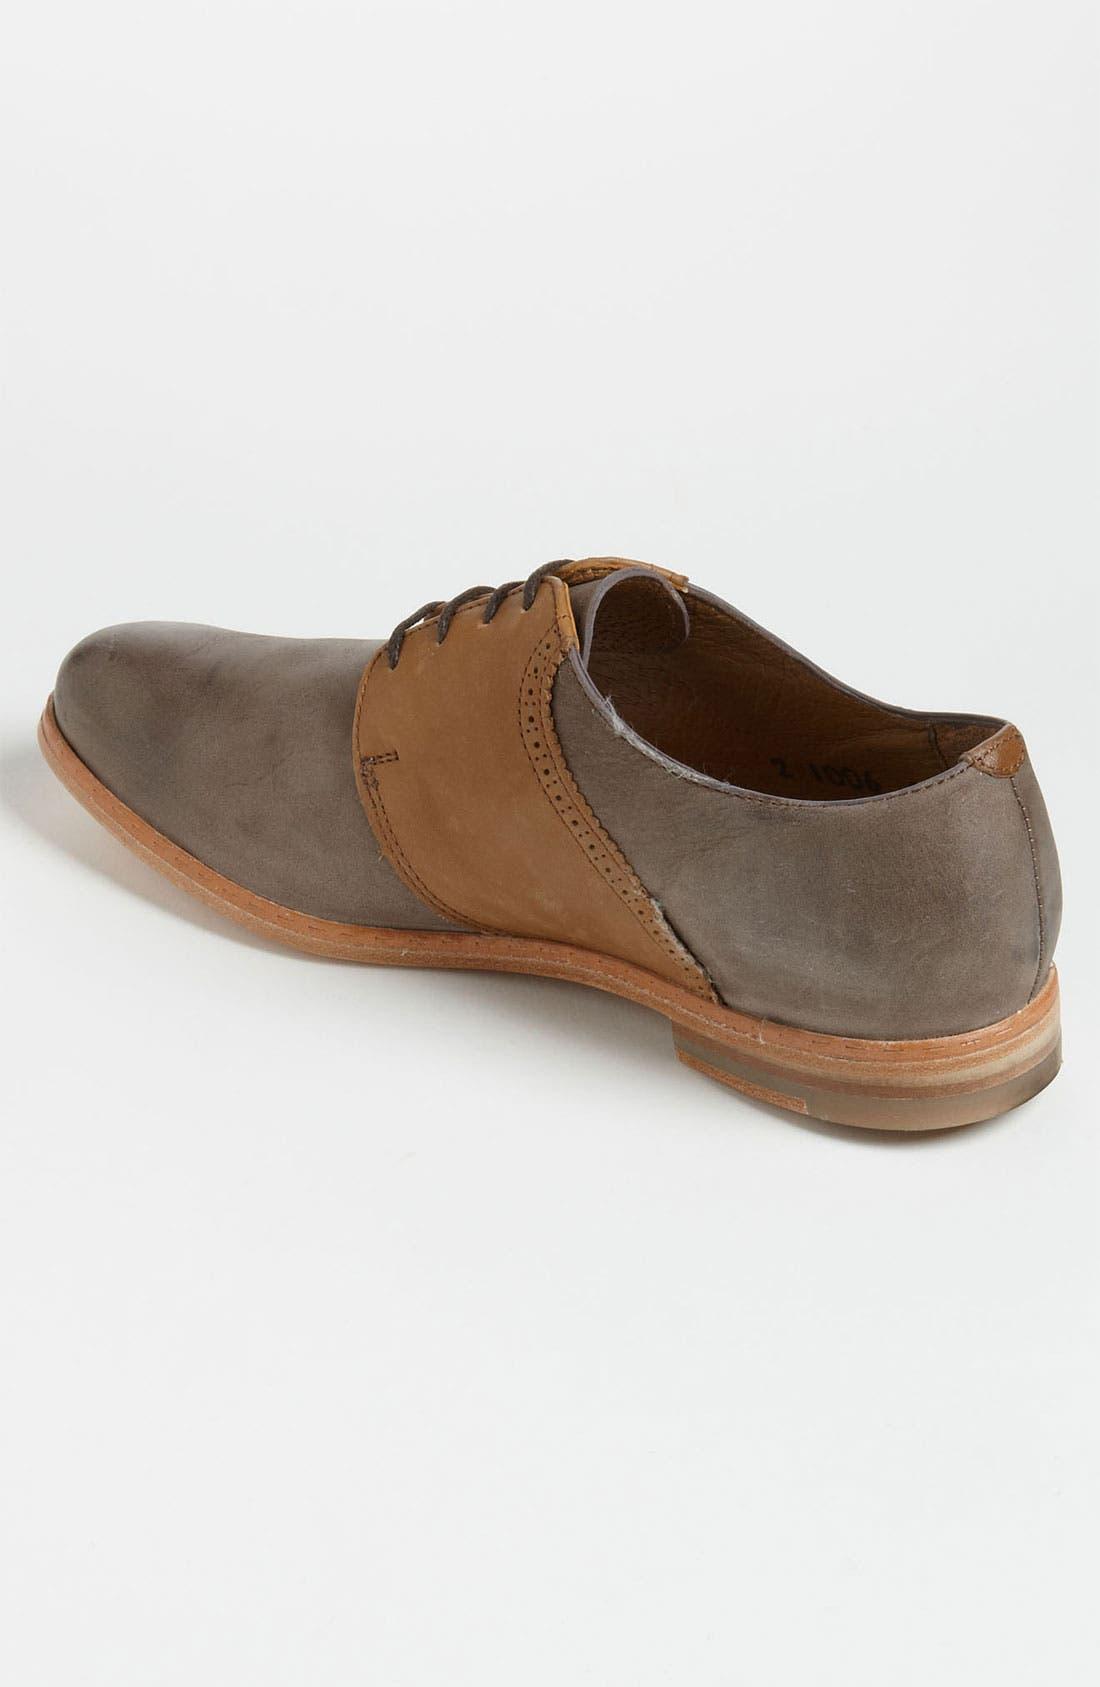 Alternate Image 2  - J.D. Fisk 'Mosimo' Saddle Shoe